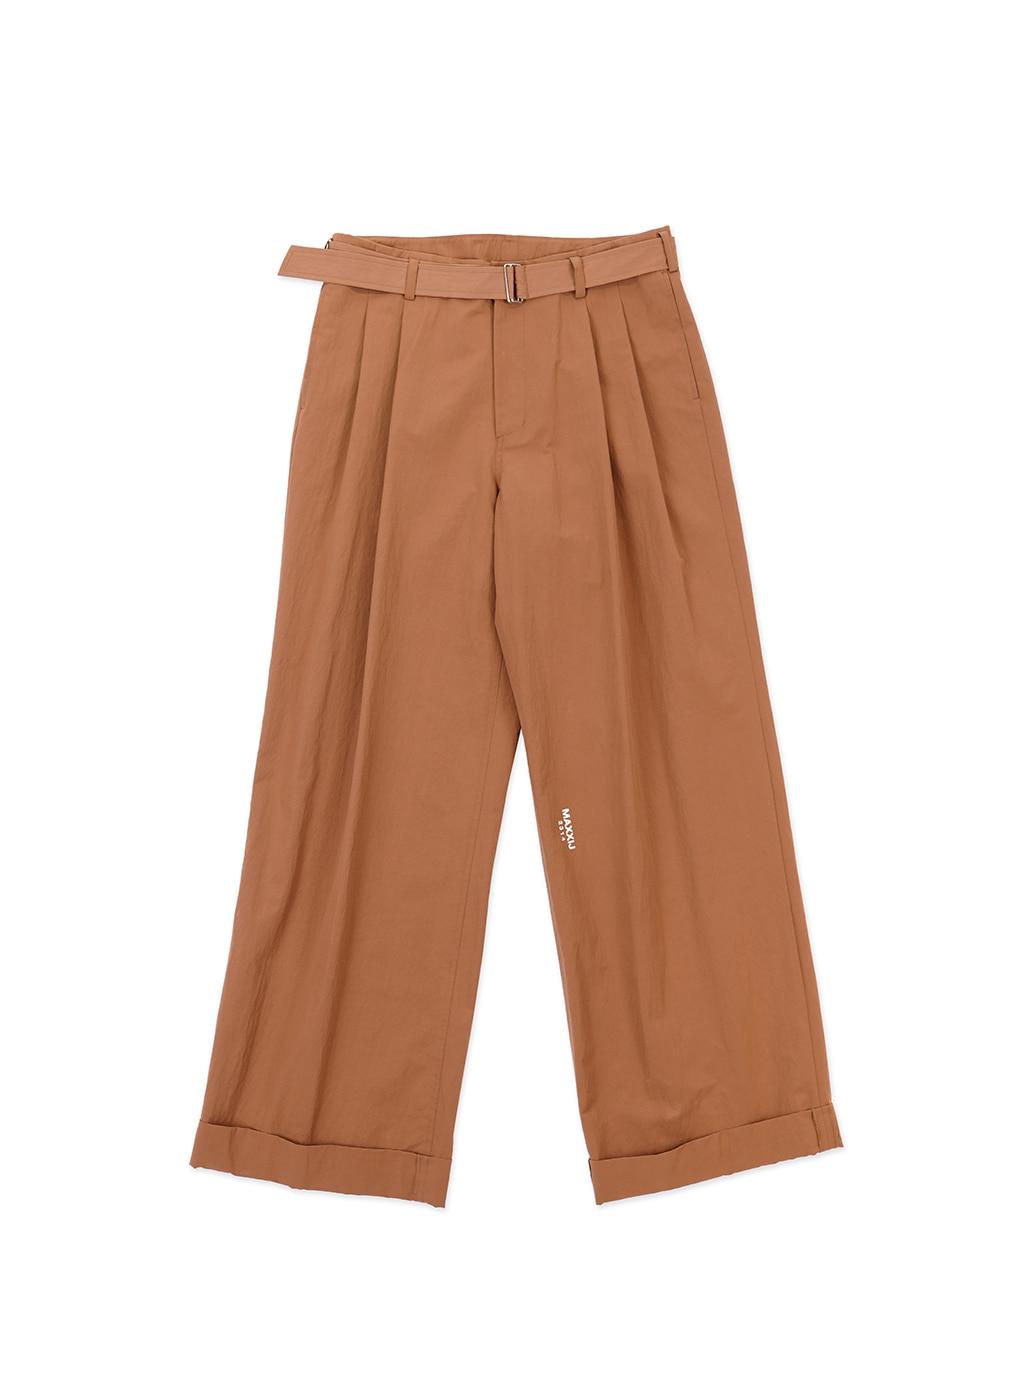 Brown Cotton Nylon Loose Trousers